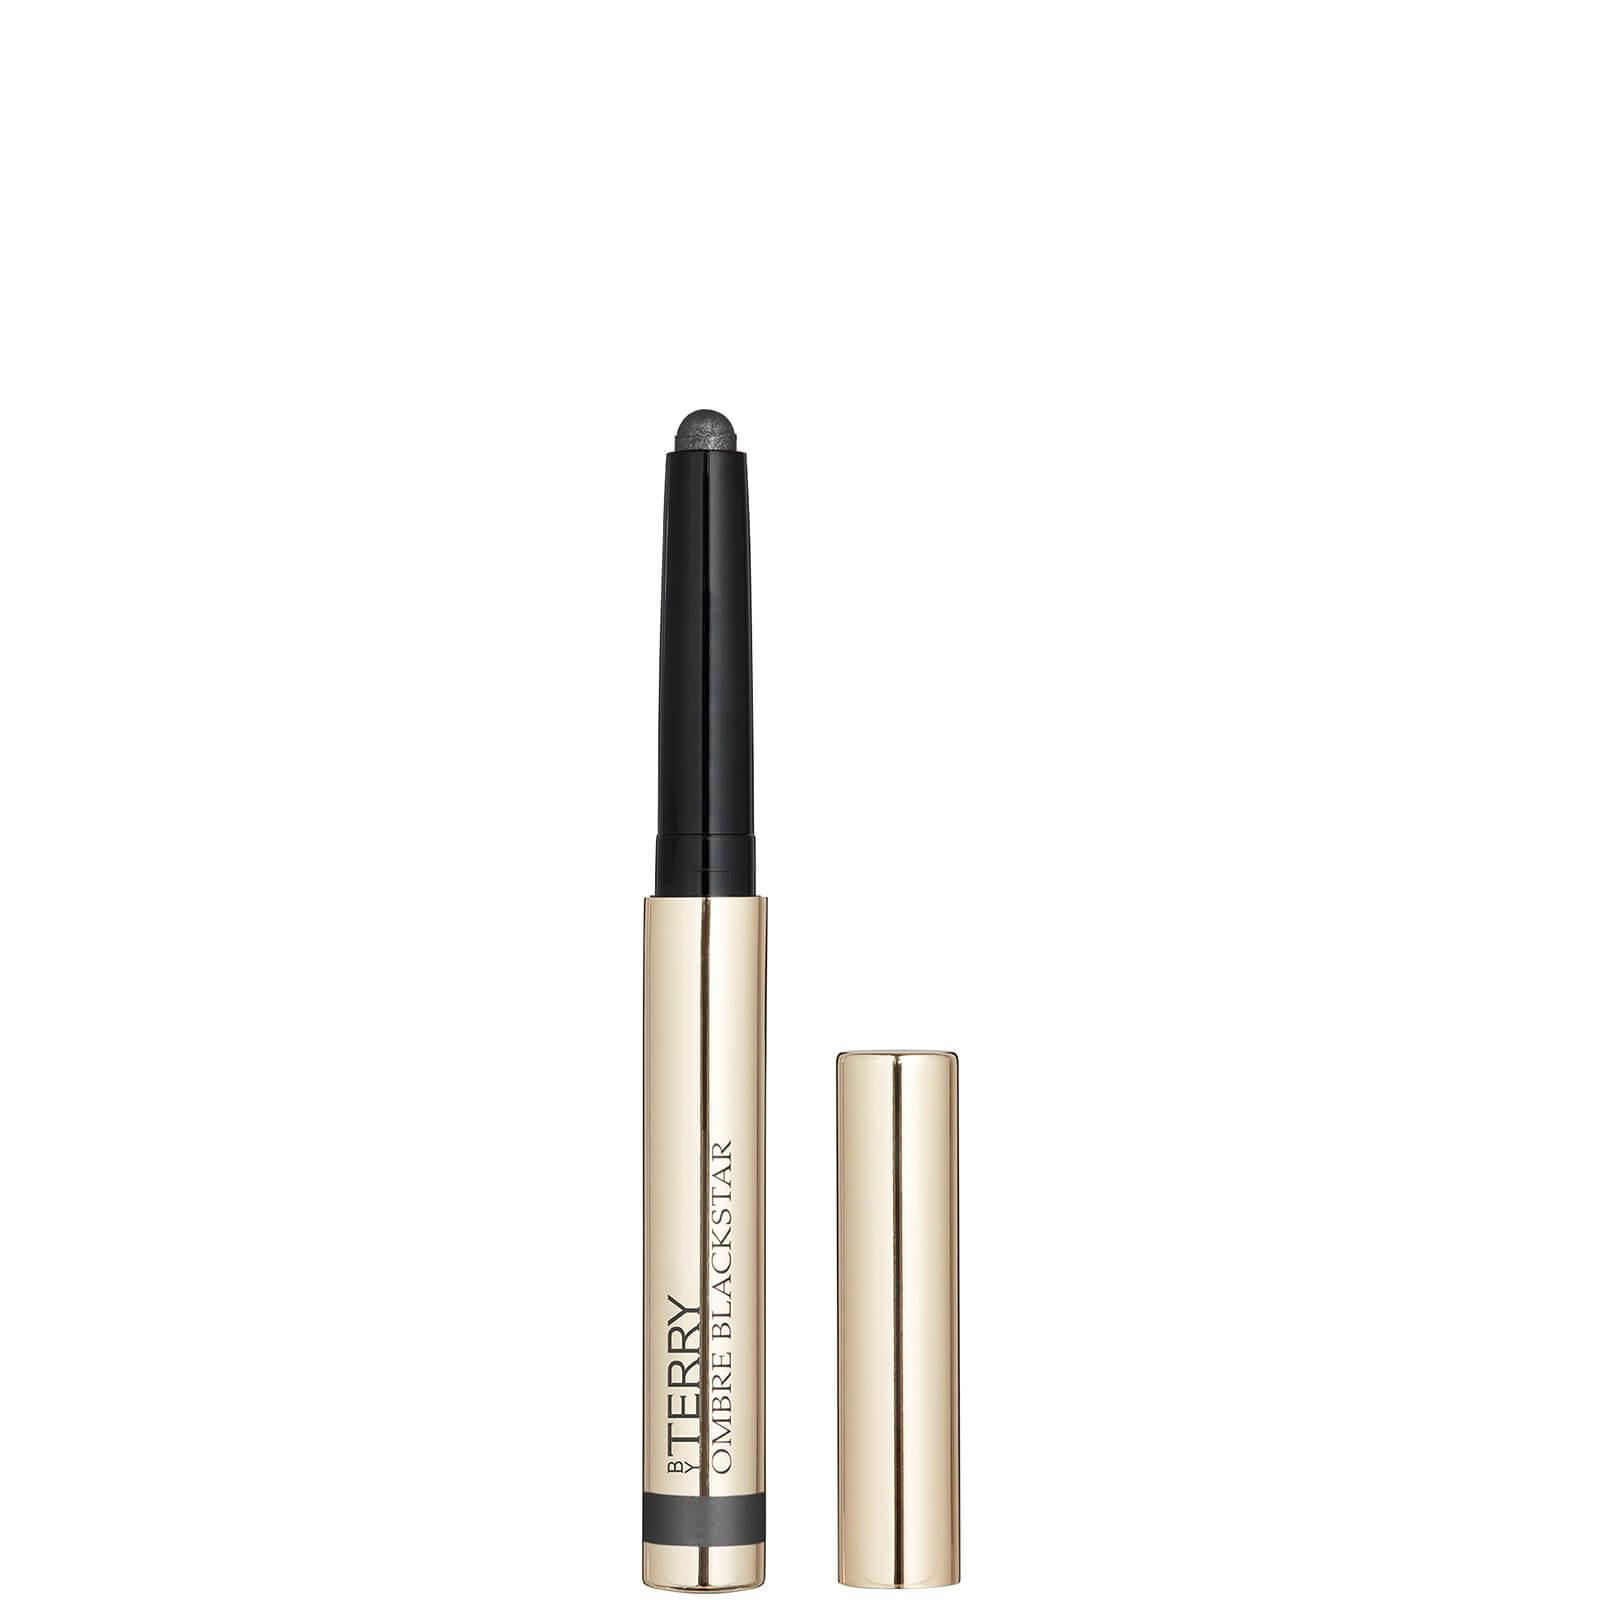 Купить Тени-карандаш для век By Terry Ombre Blackstar Eye Shadows 1, 64 г (различные оттенки) - 1. Black Pearl